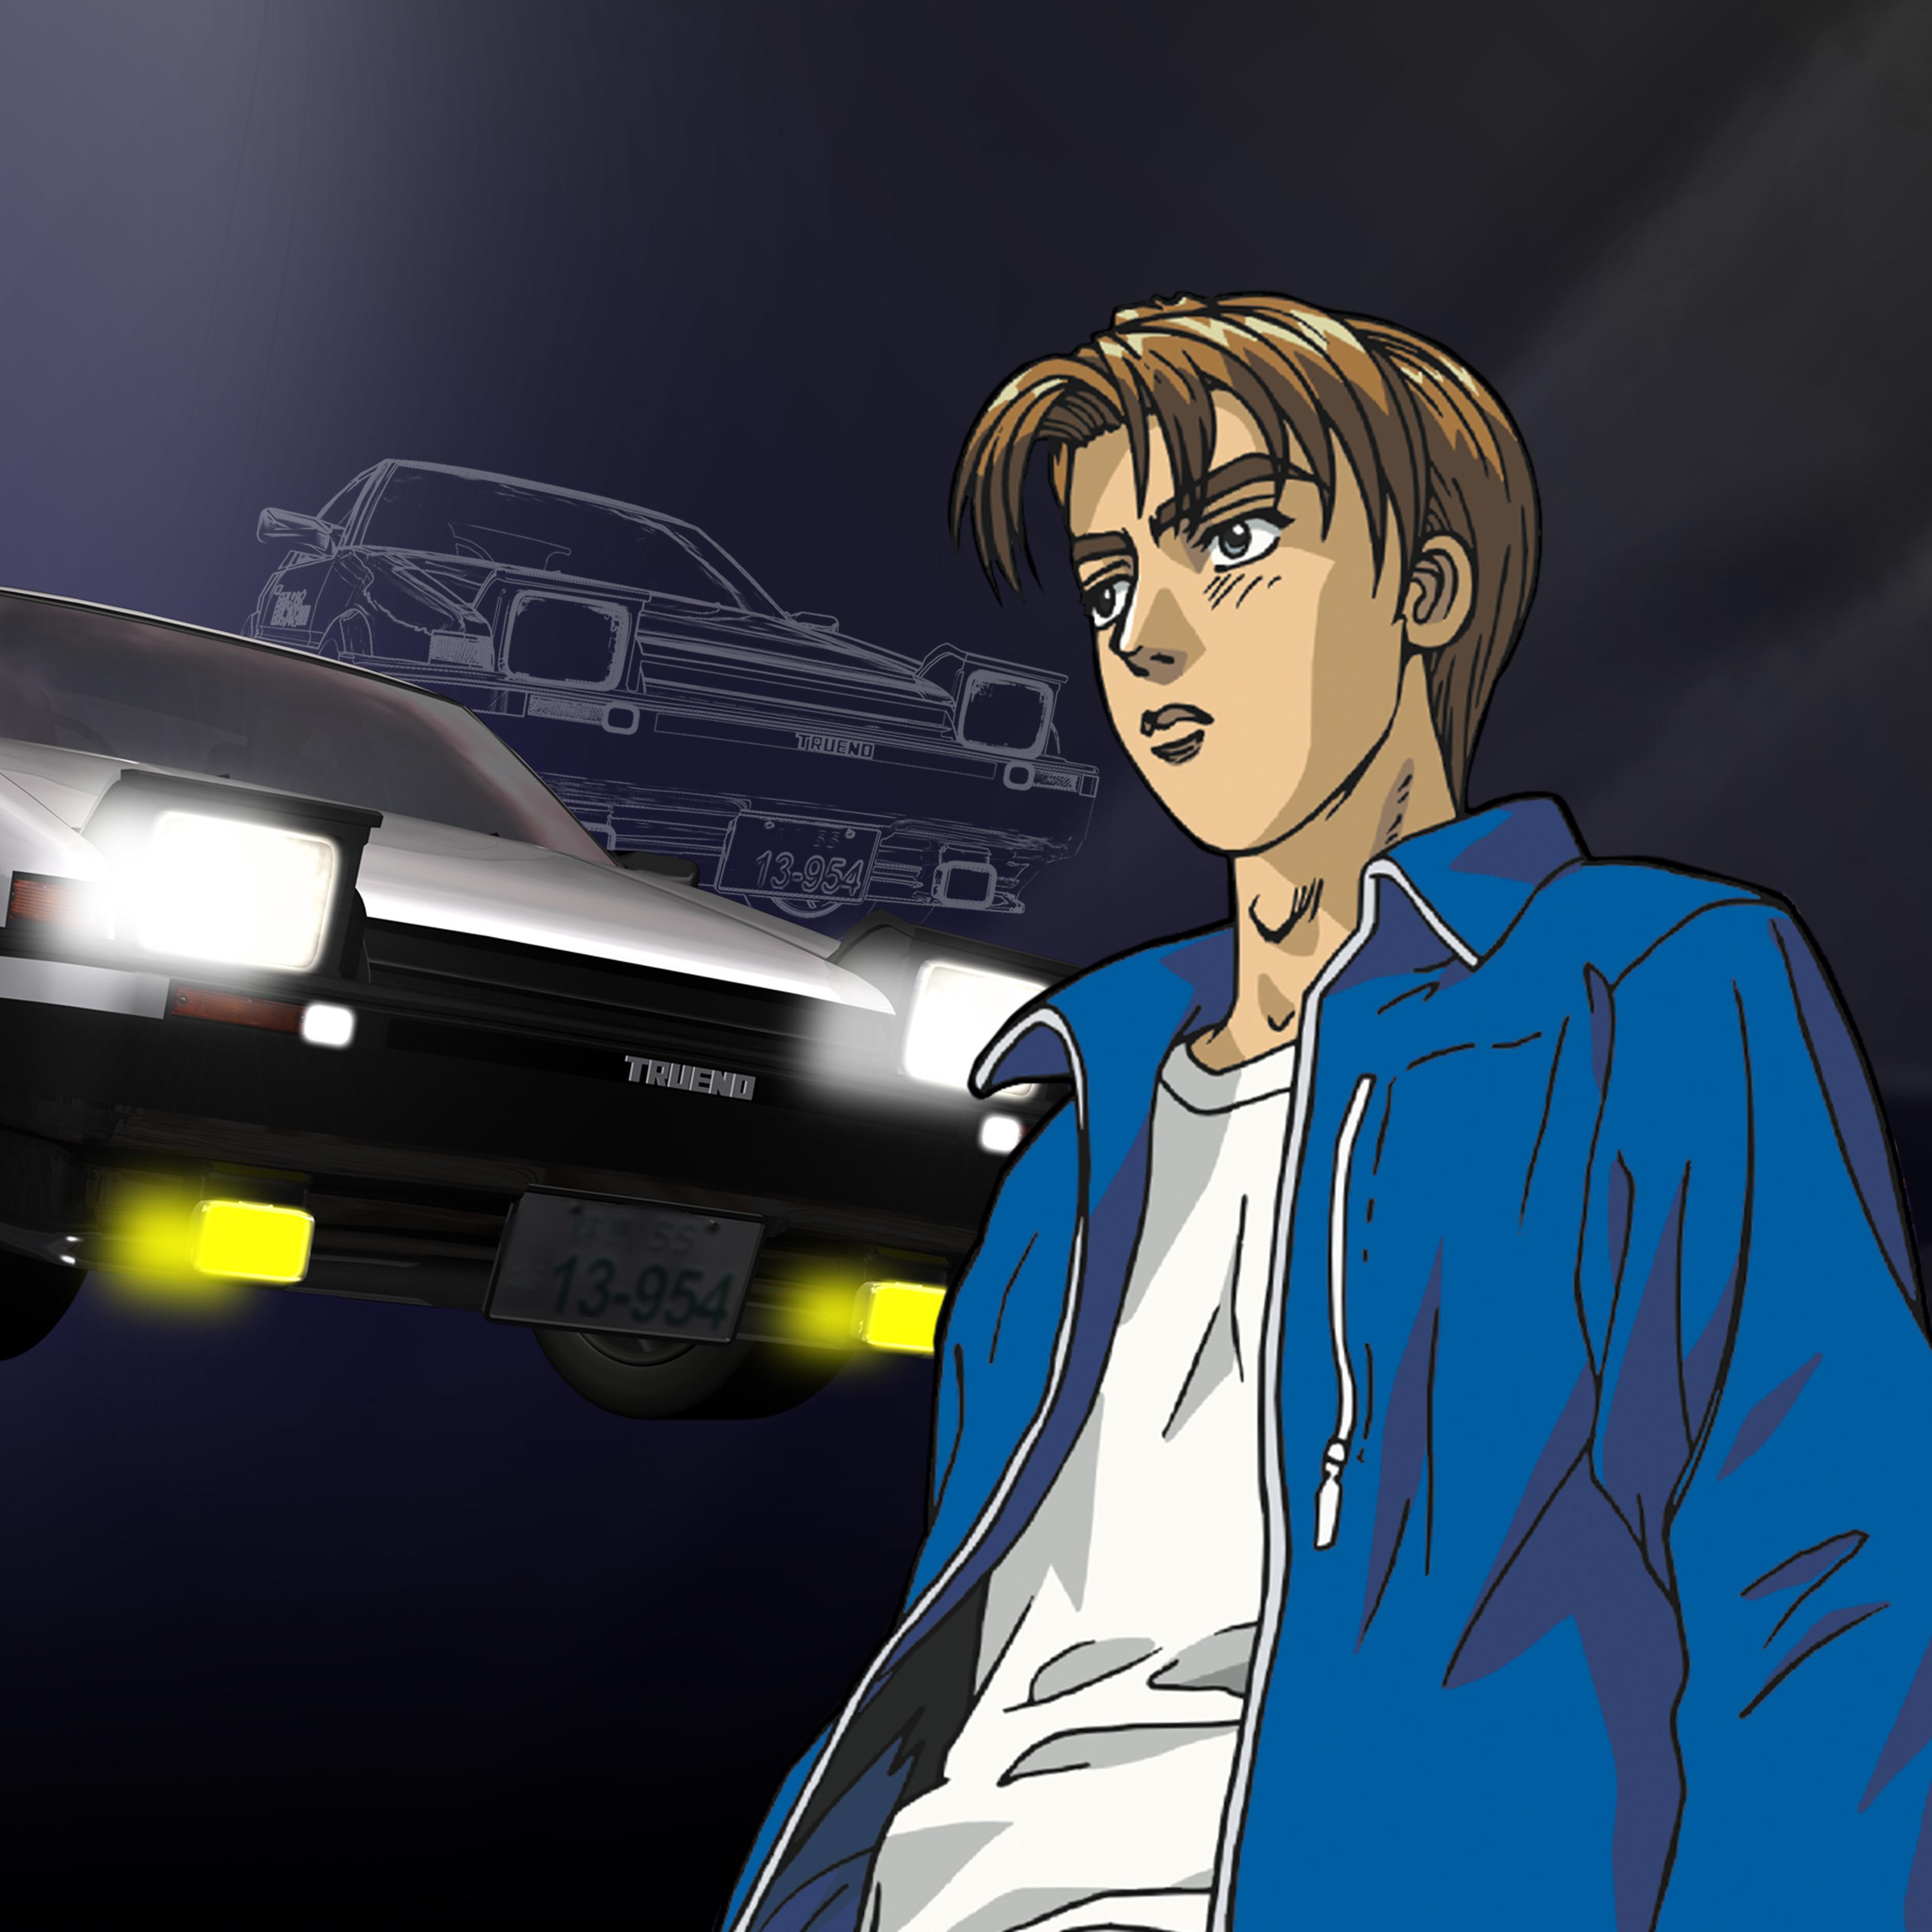 Watch initial d episodes sub dub action adventure shounen anime funimation